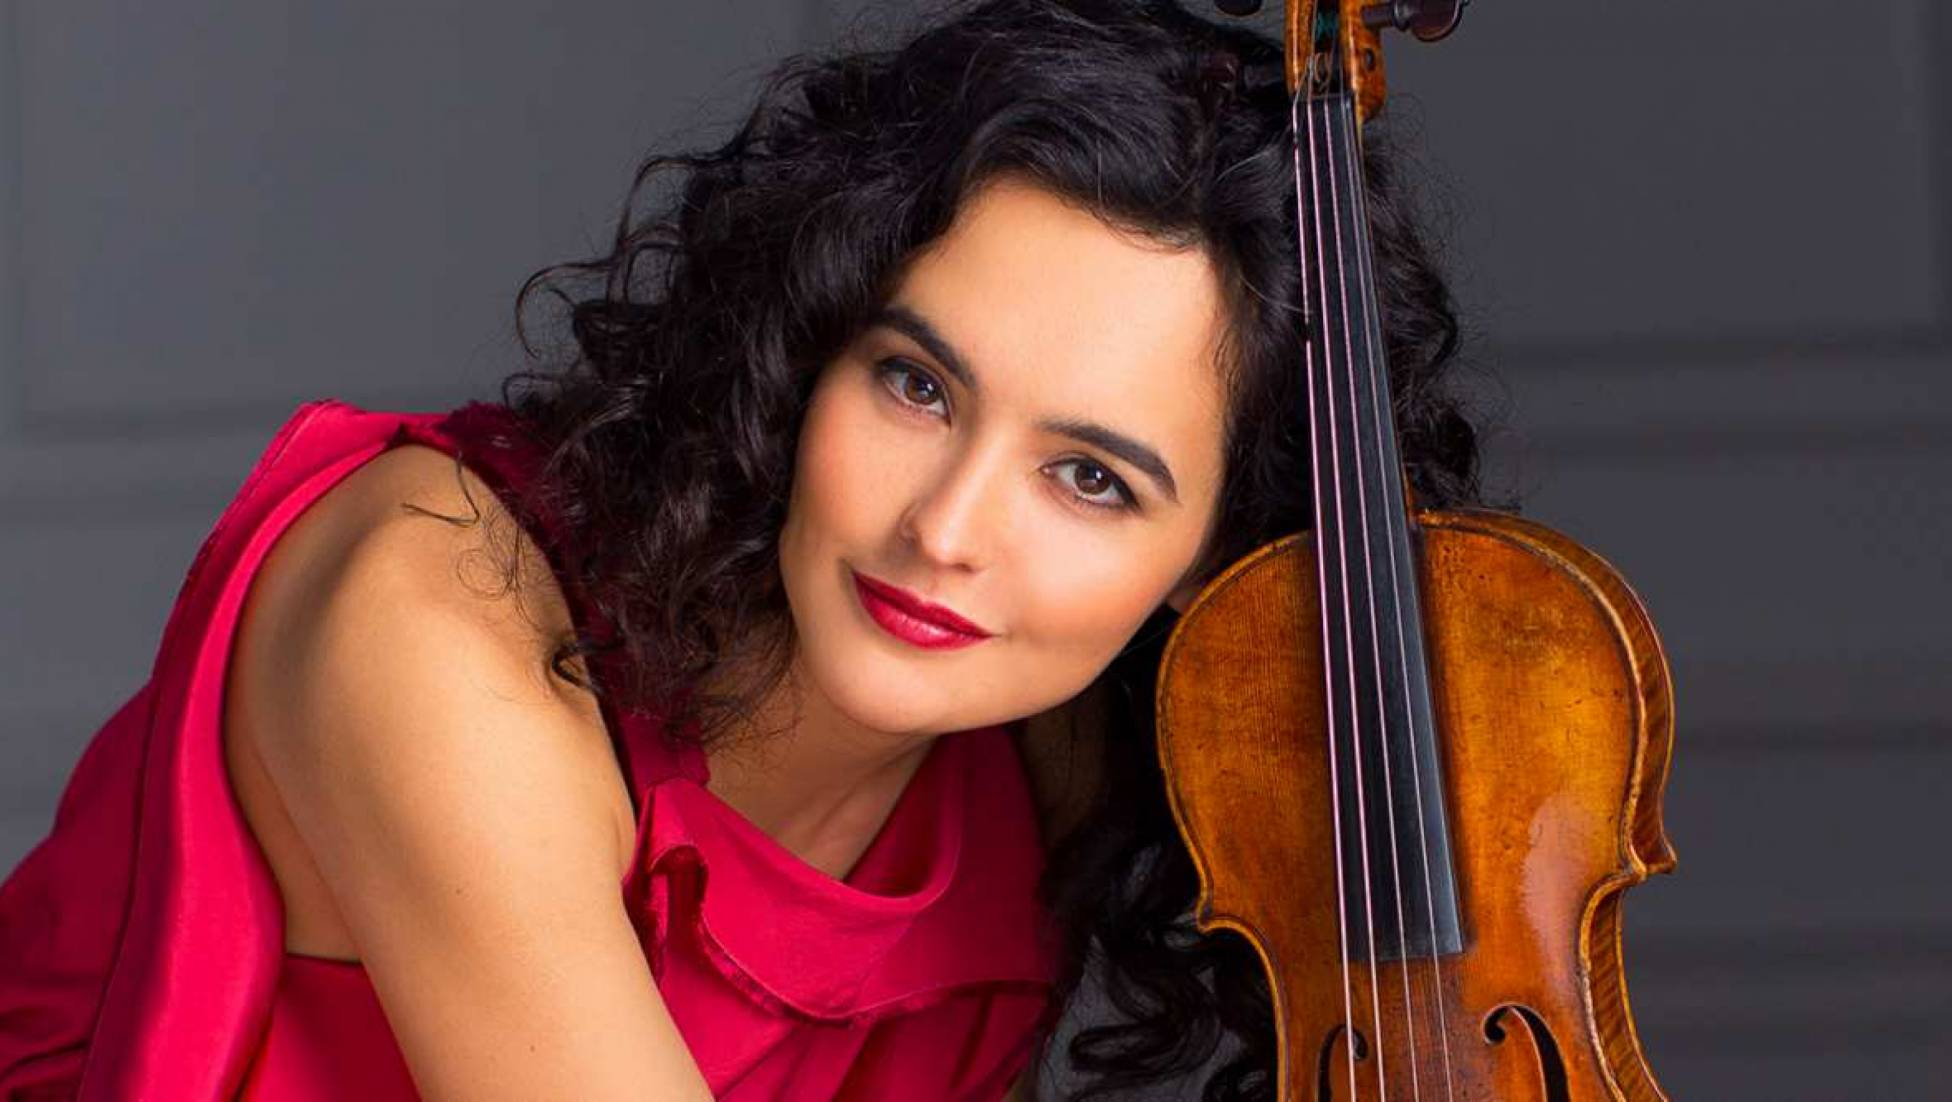 Alena Baeva in Schumanns Vioolconcert, Duncan Ward leidt Brahms